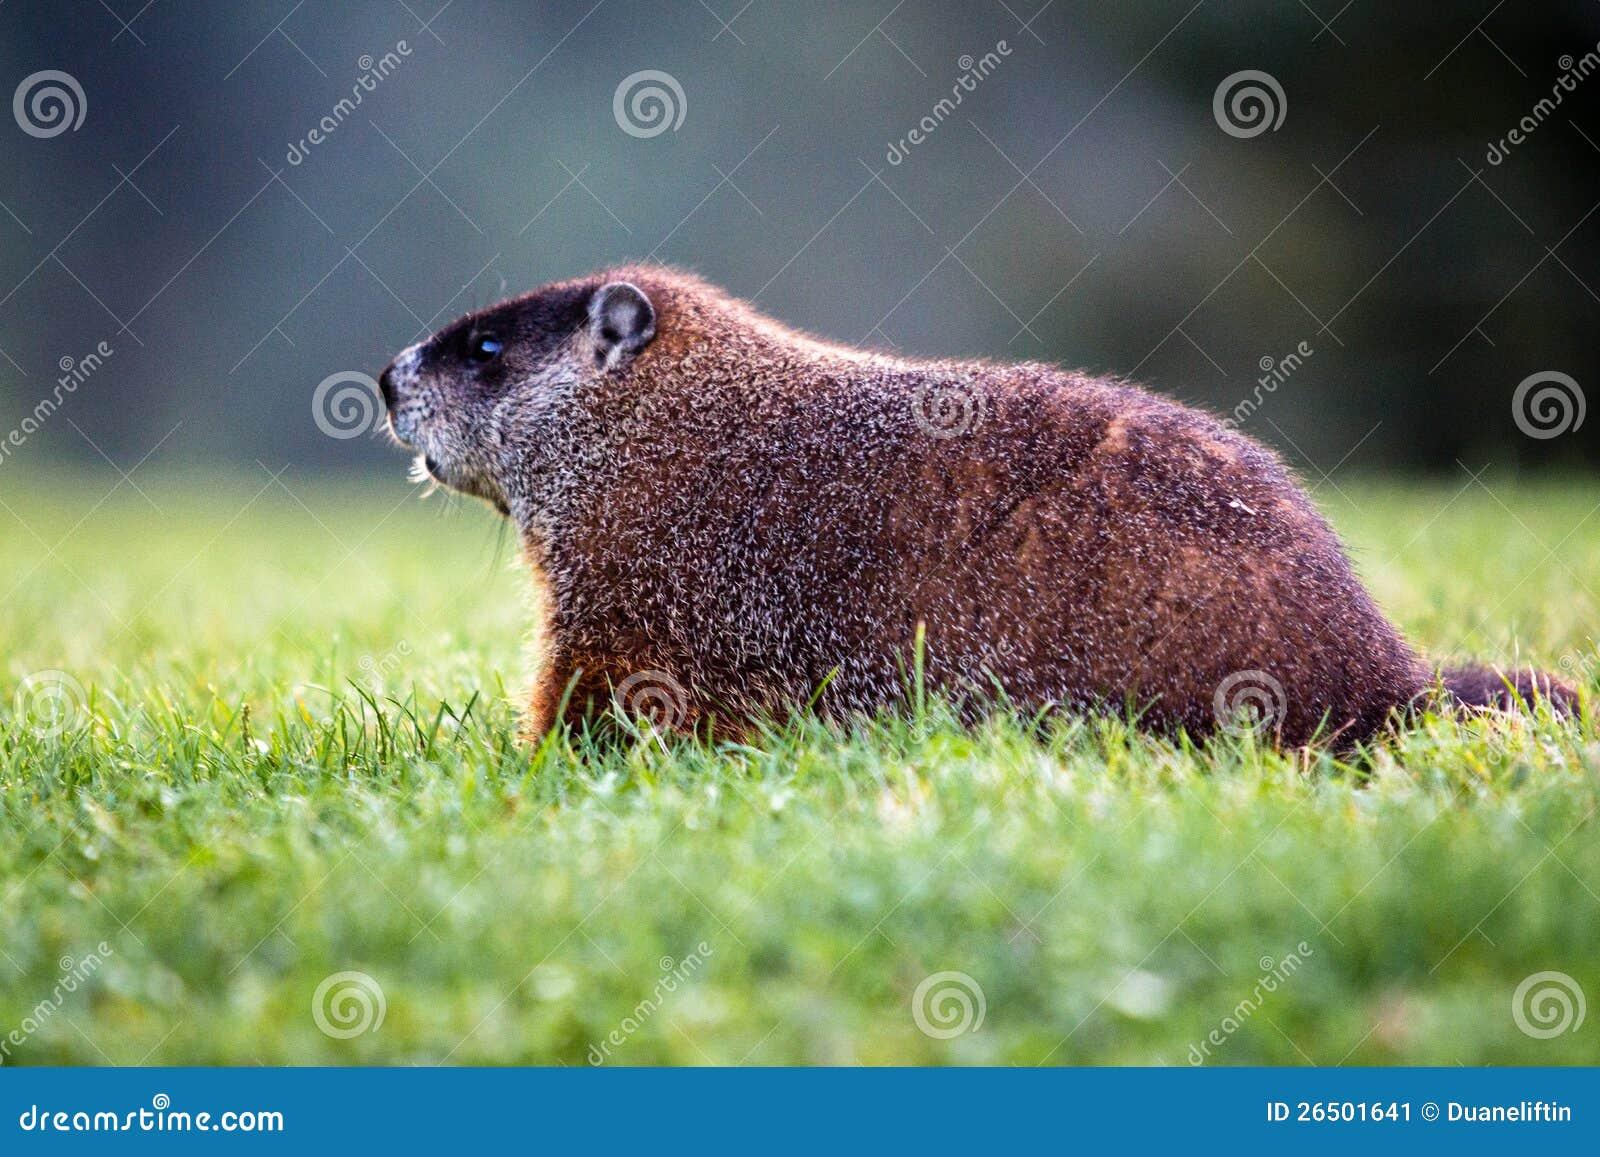 Groundhog on Lawn